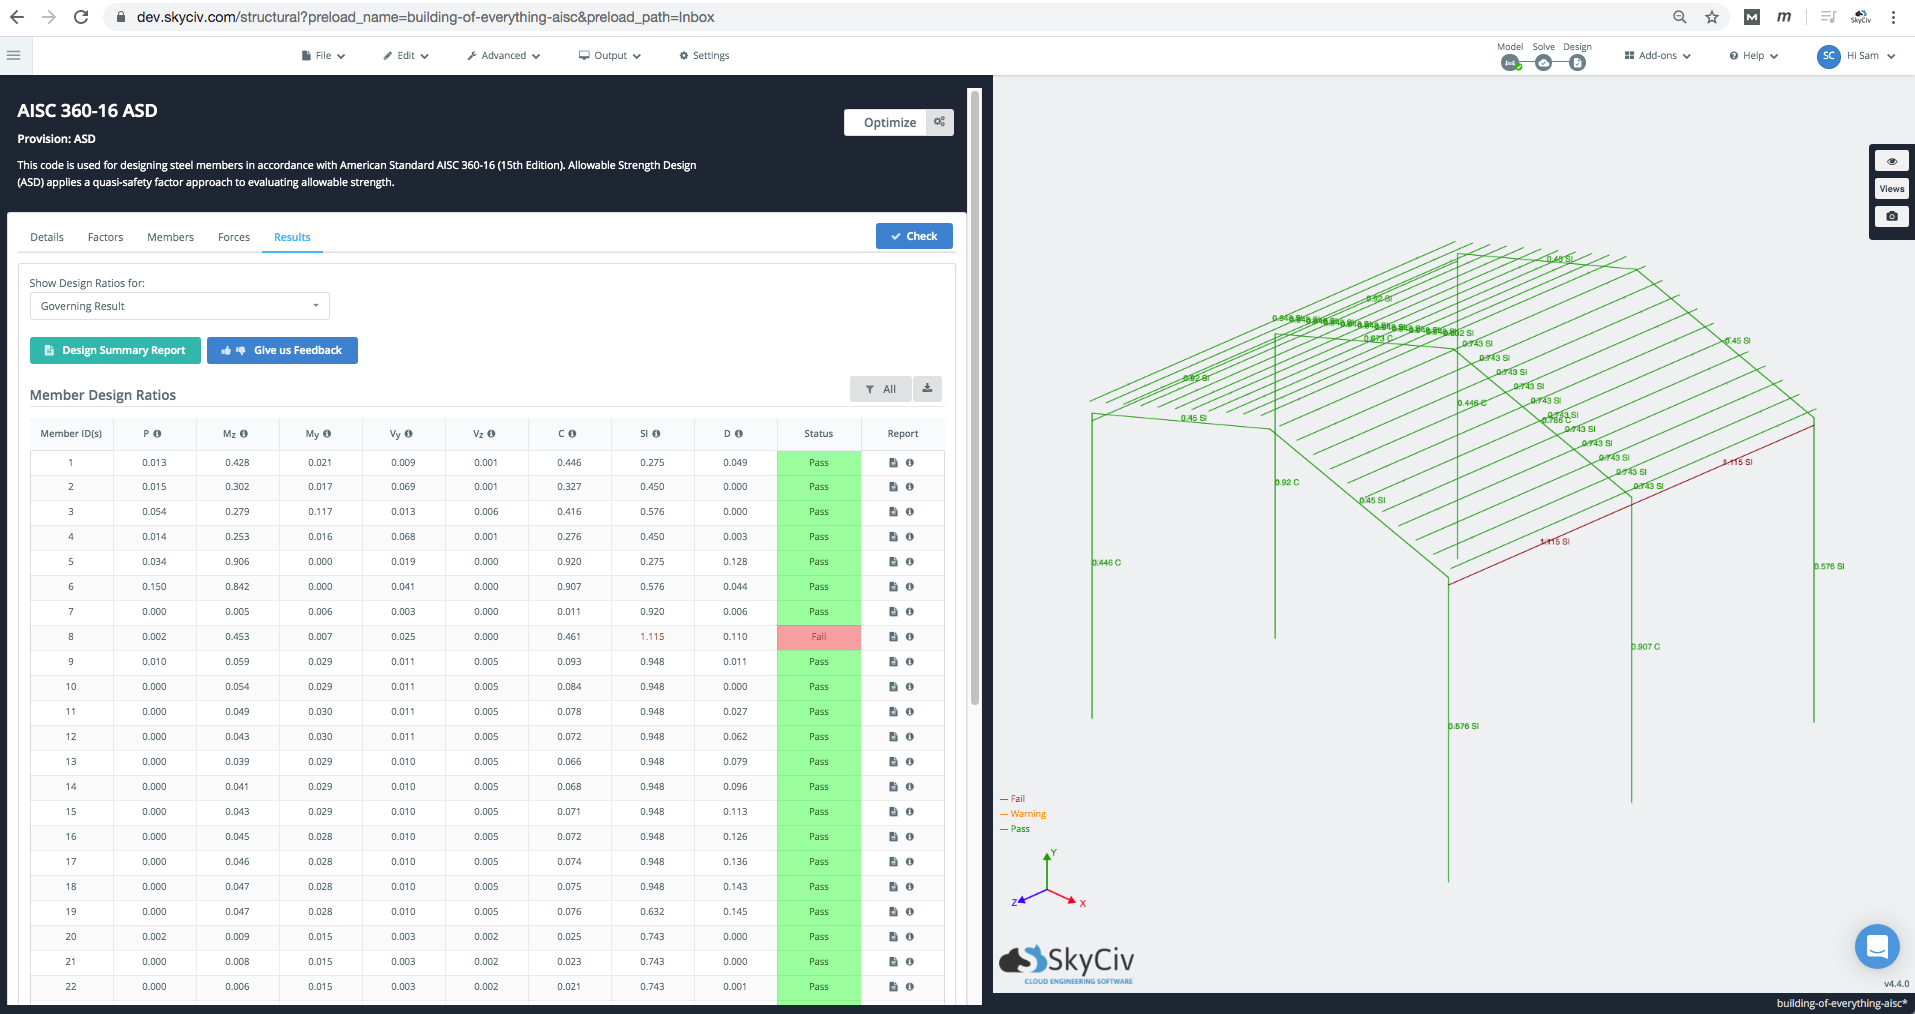 optimization-run-results-aisc-skyciv-structural-analysis-software